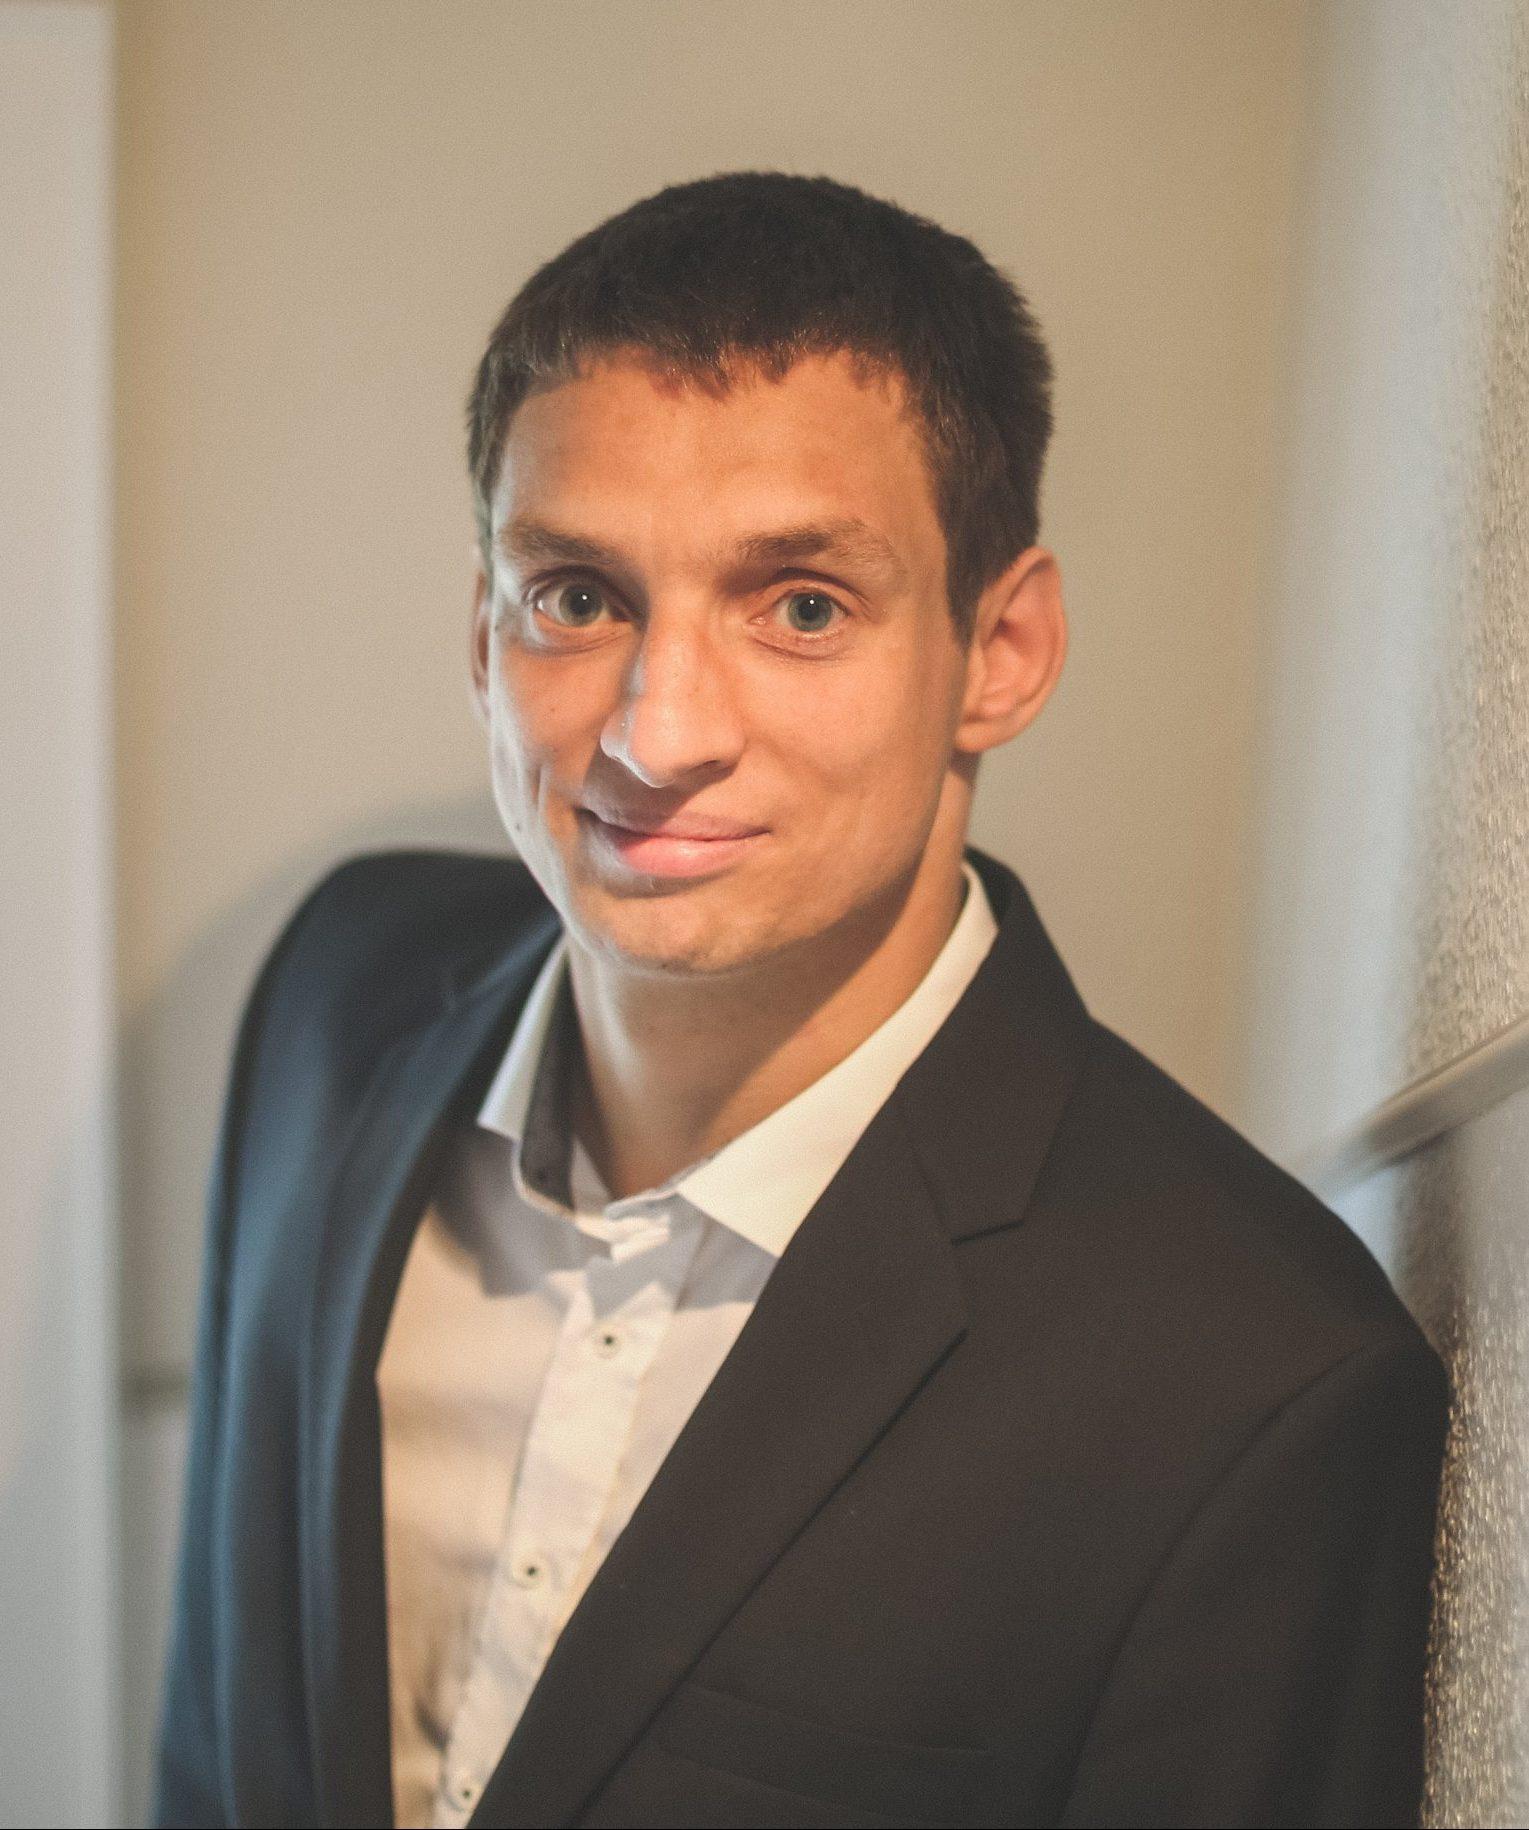 Christian Marzahl